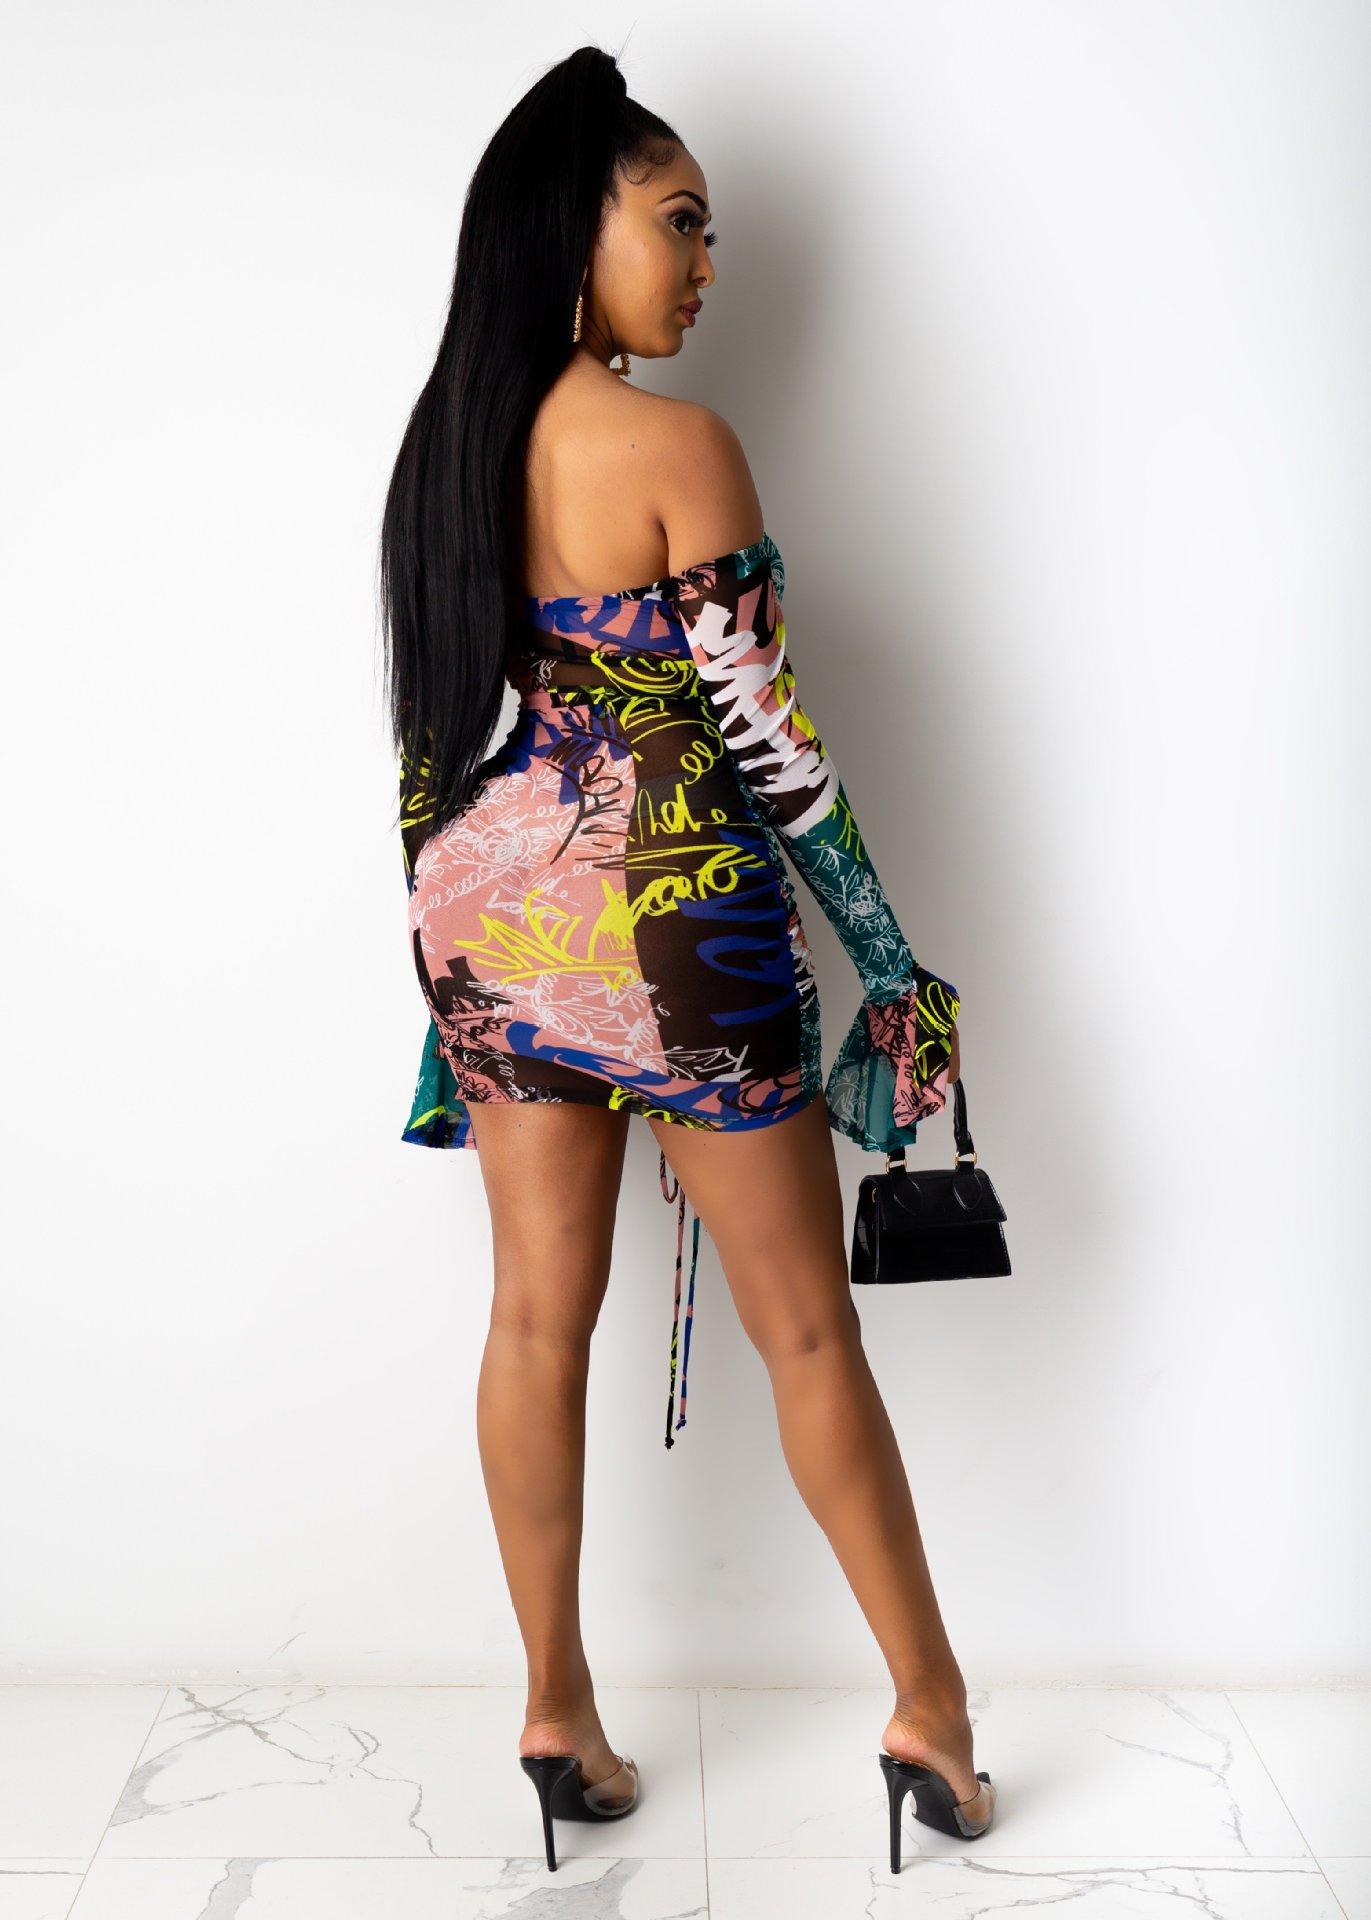 H113ca2dc2ec1426f94d994cd3f6f009b1 - Adogirl Snake Print Long Sleeve Dress Women Evening Party Night Dresses Sexy Off Shoulder Drawstring Bodycon Slim Mini Dress